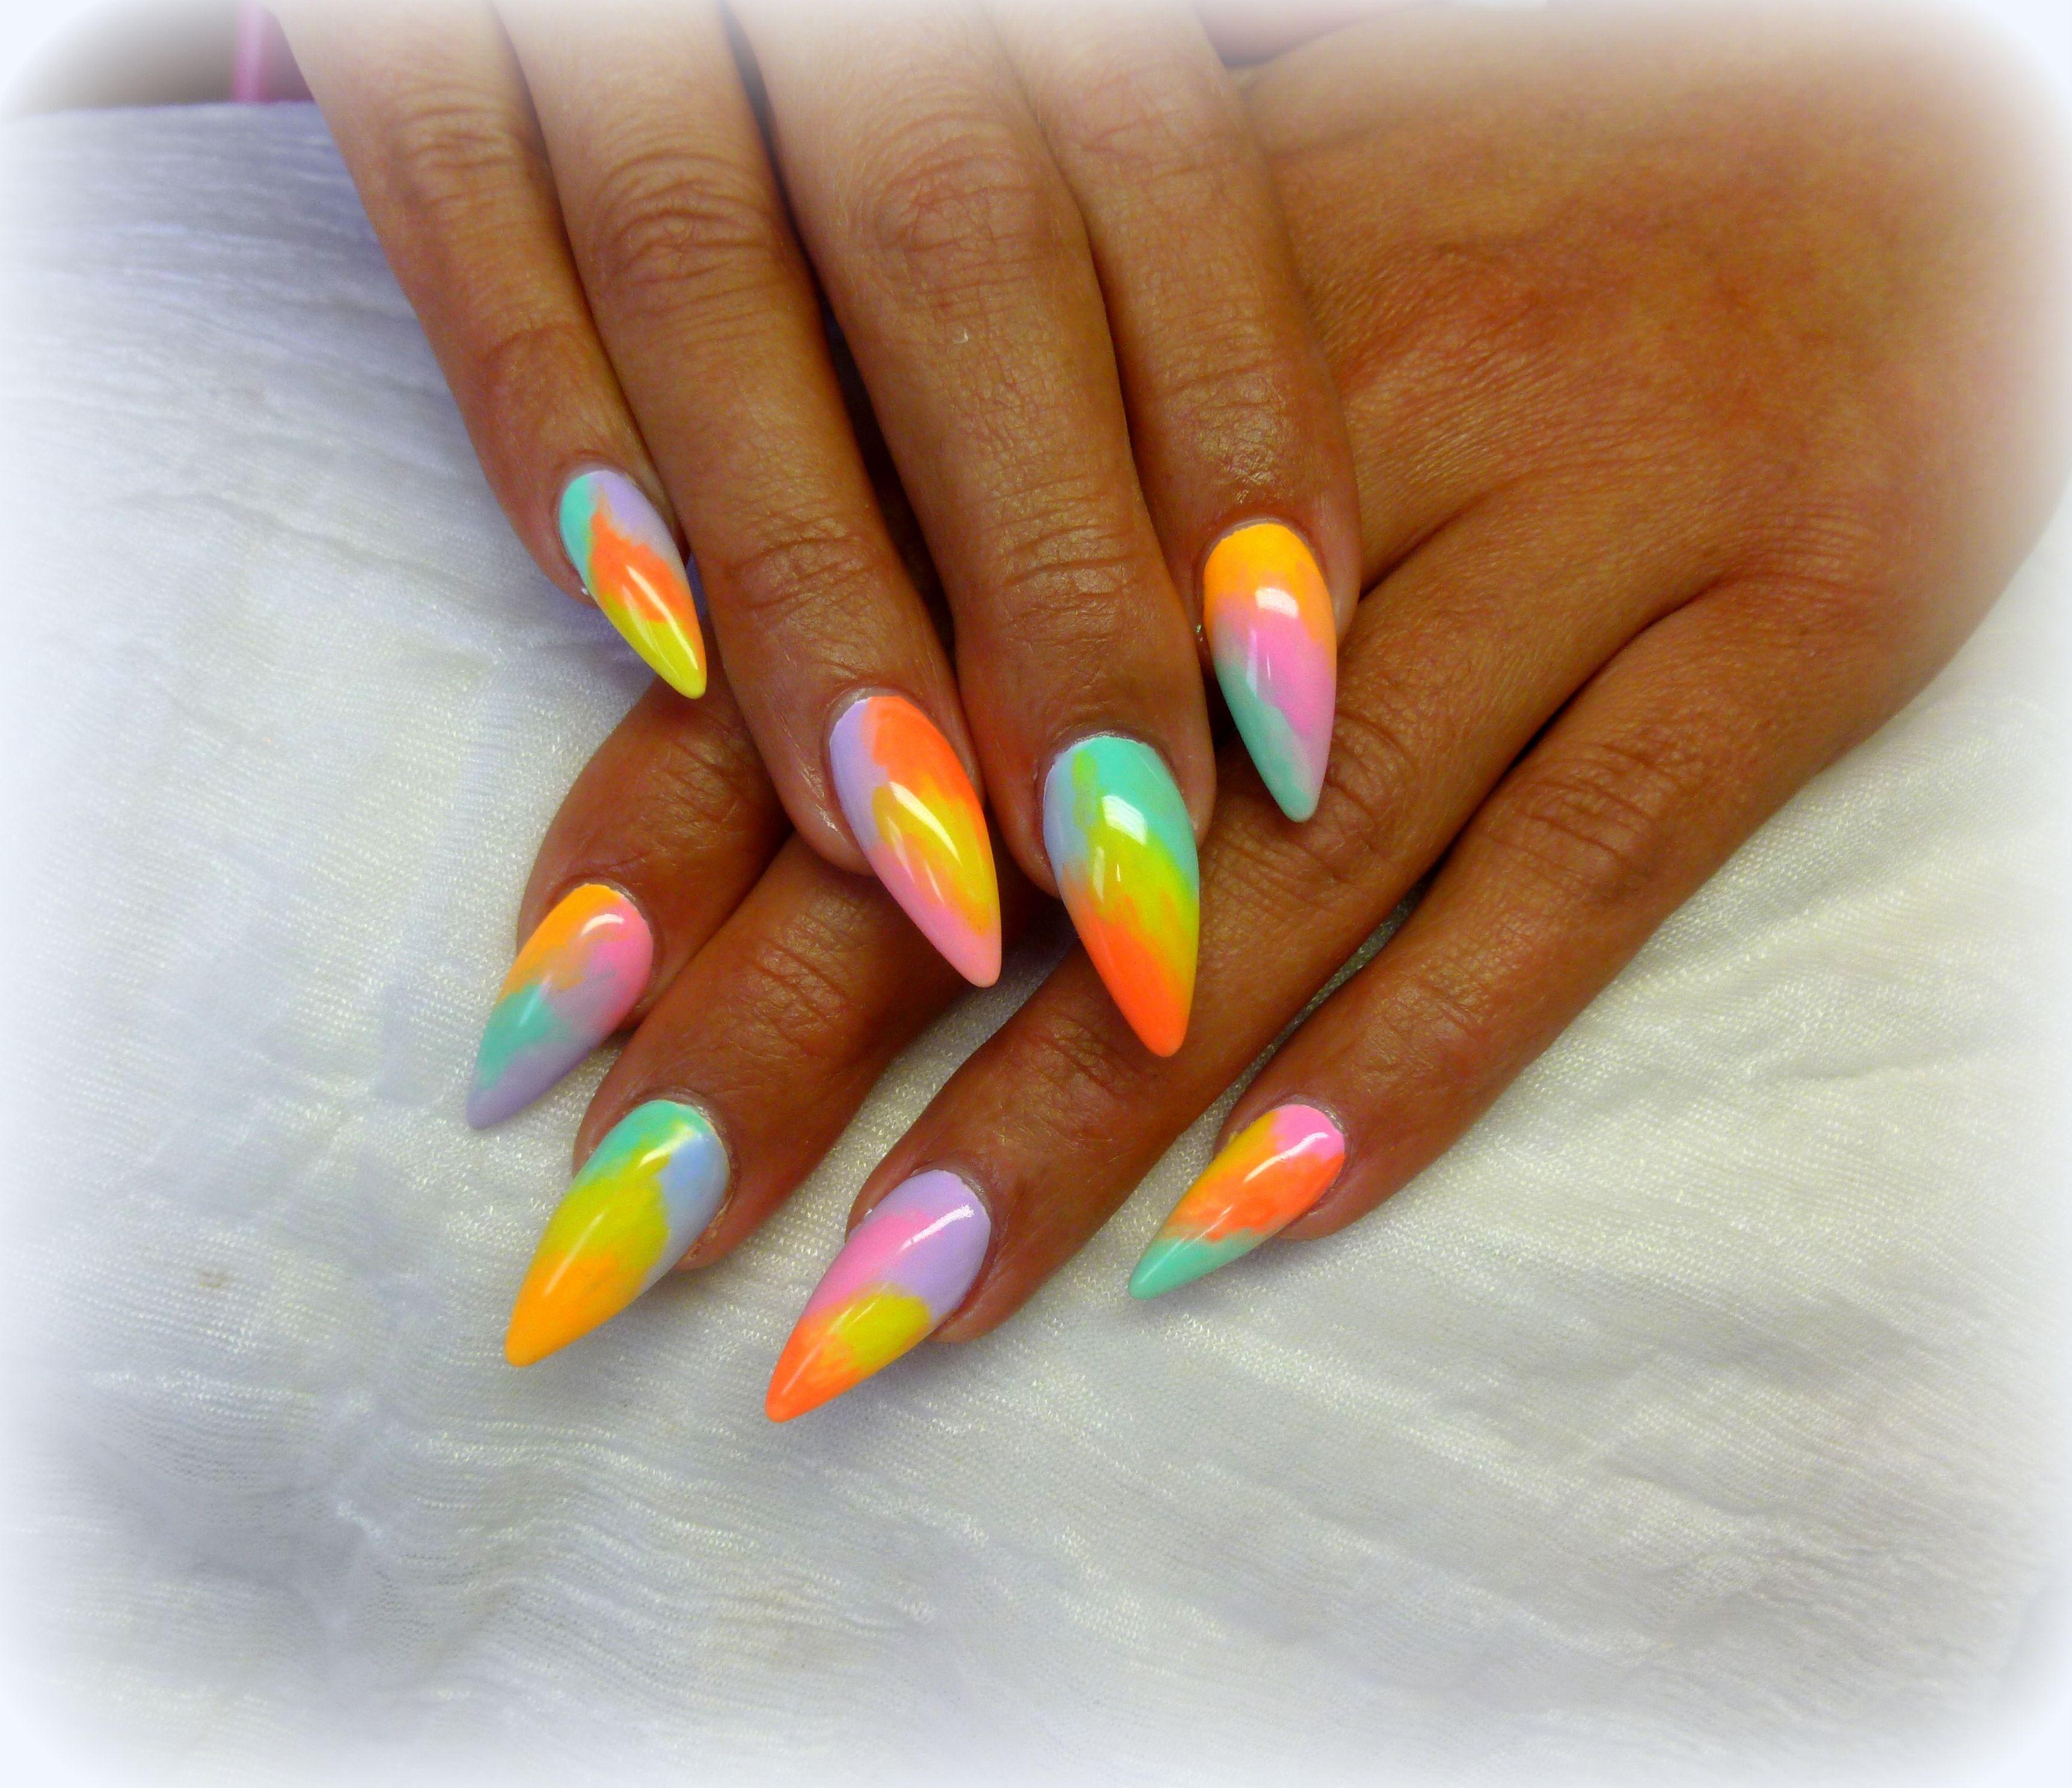 Magic Nails Gelové Nehty Barevné